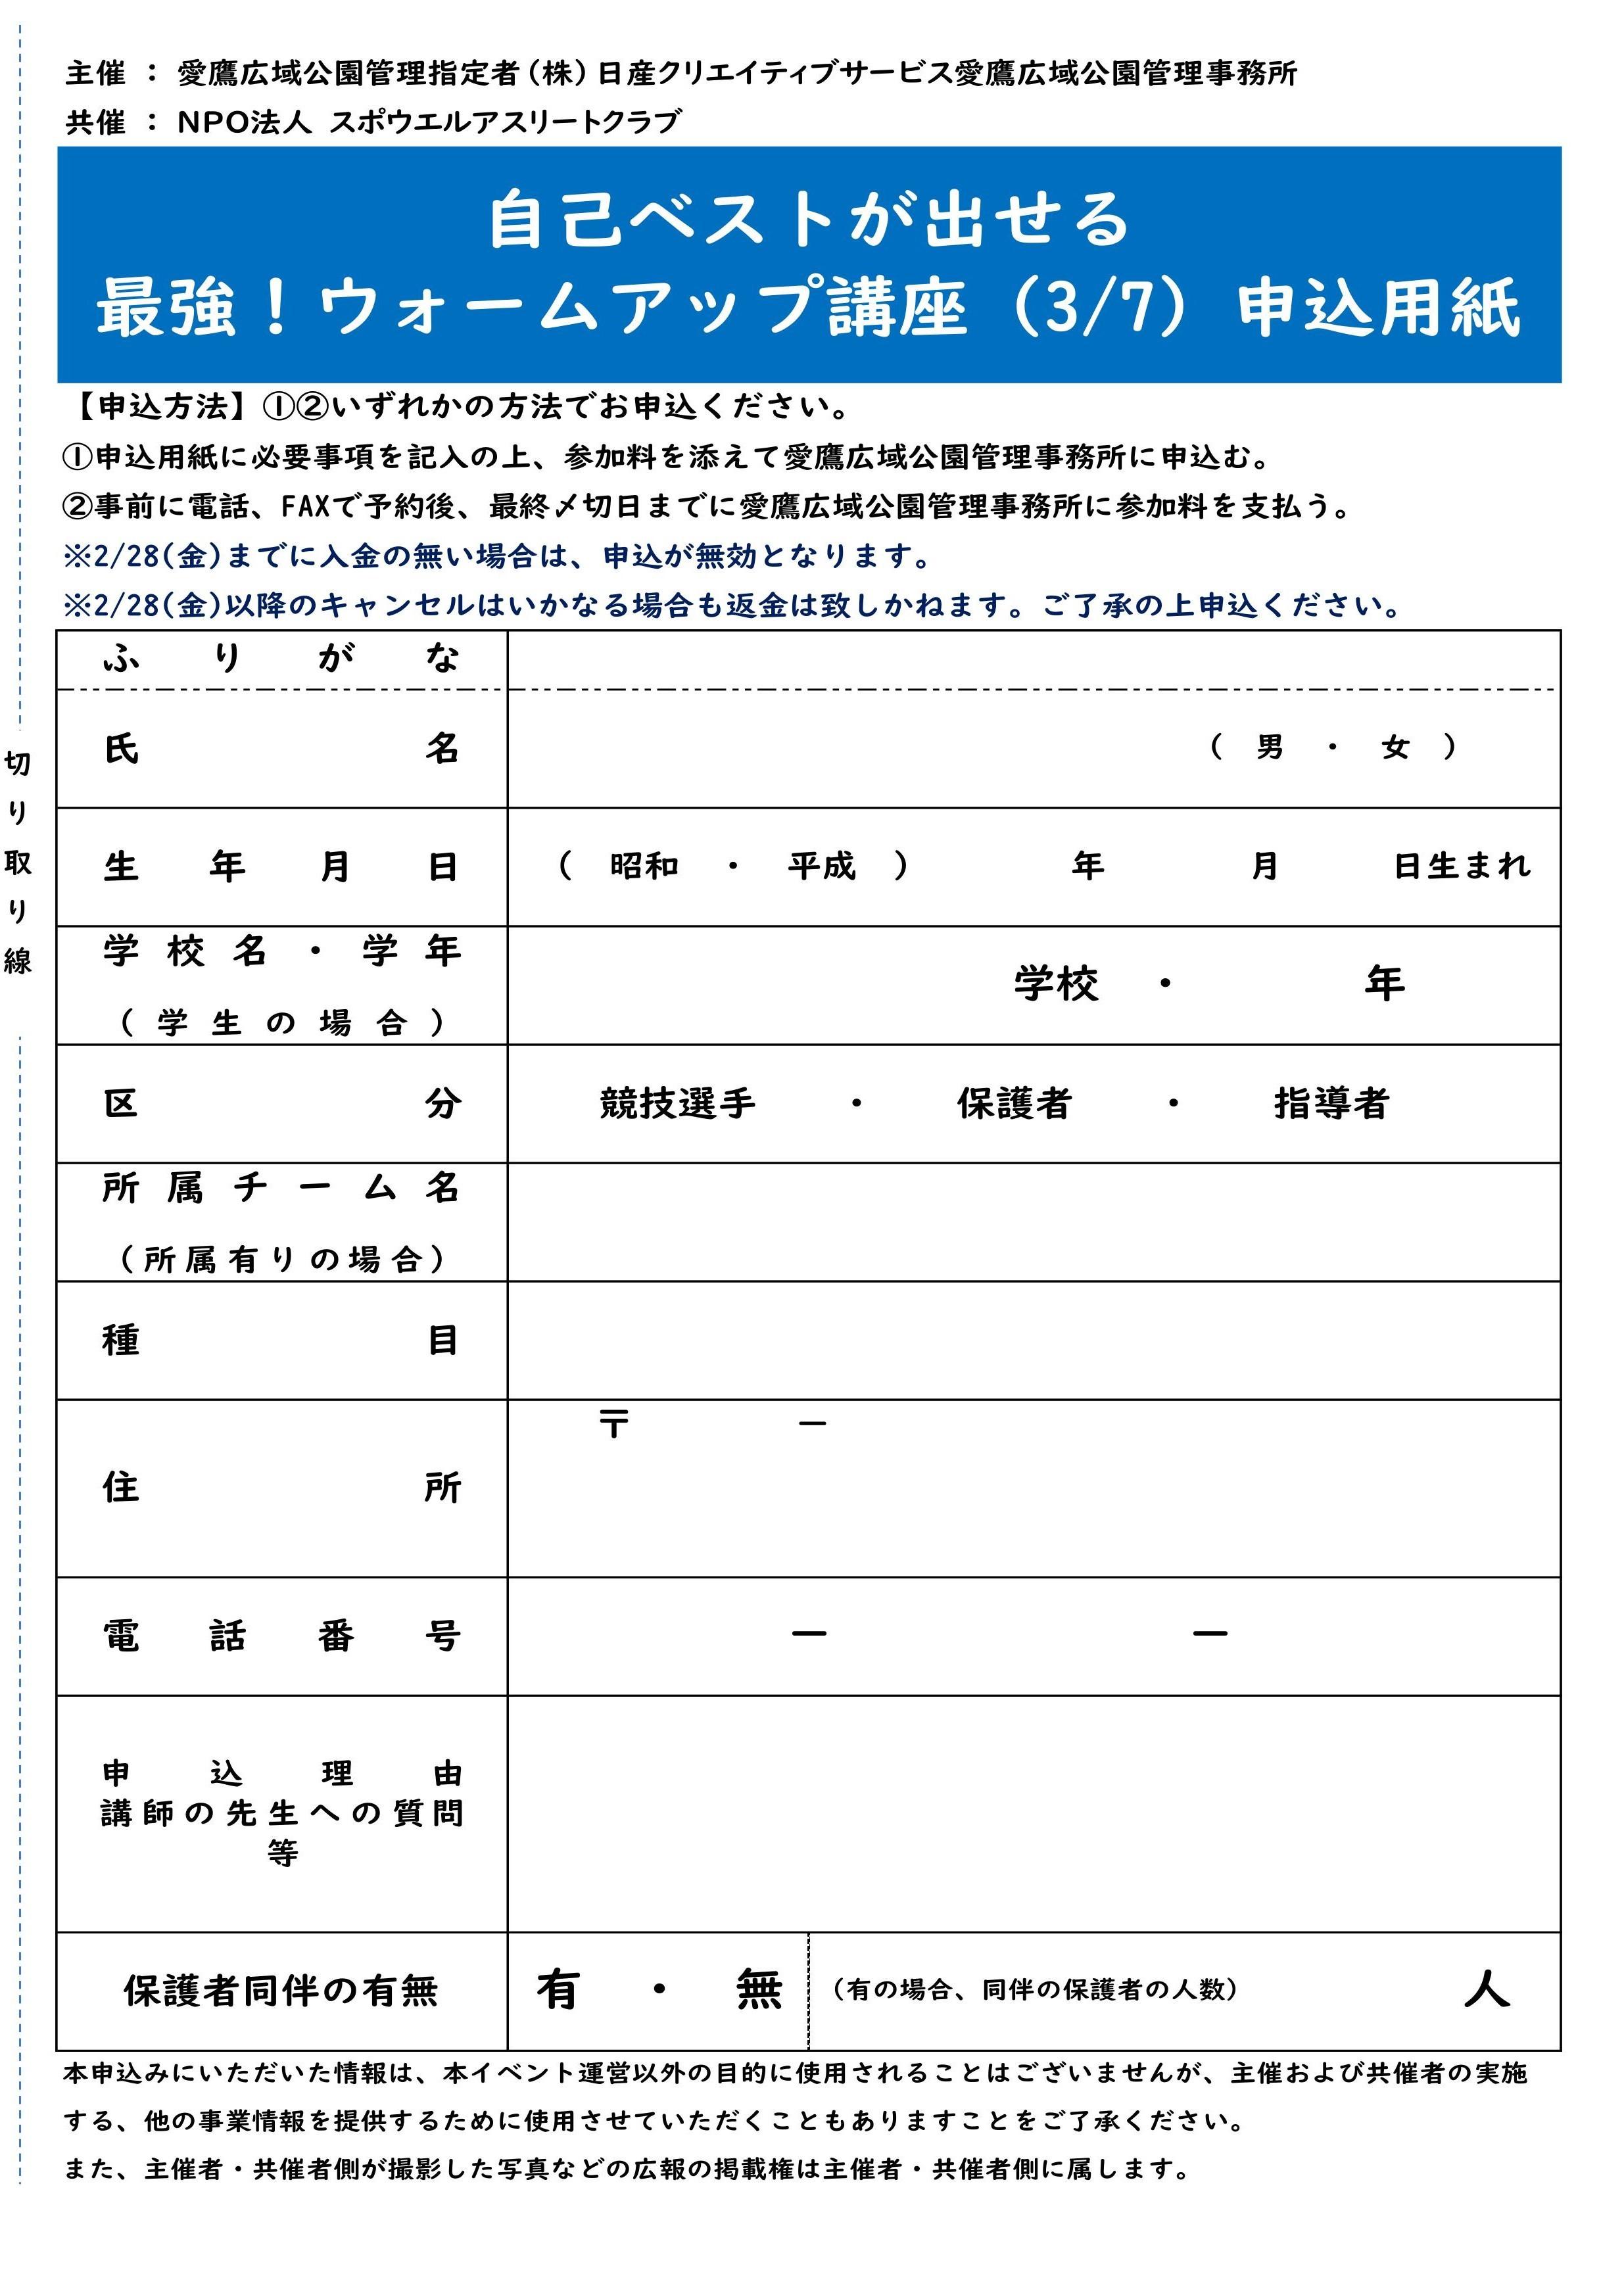 form20200307warmup20200210